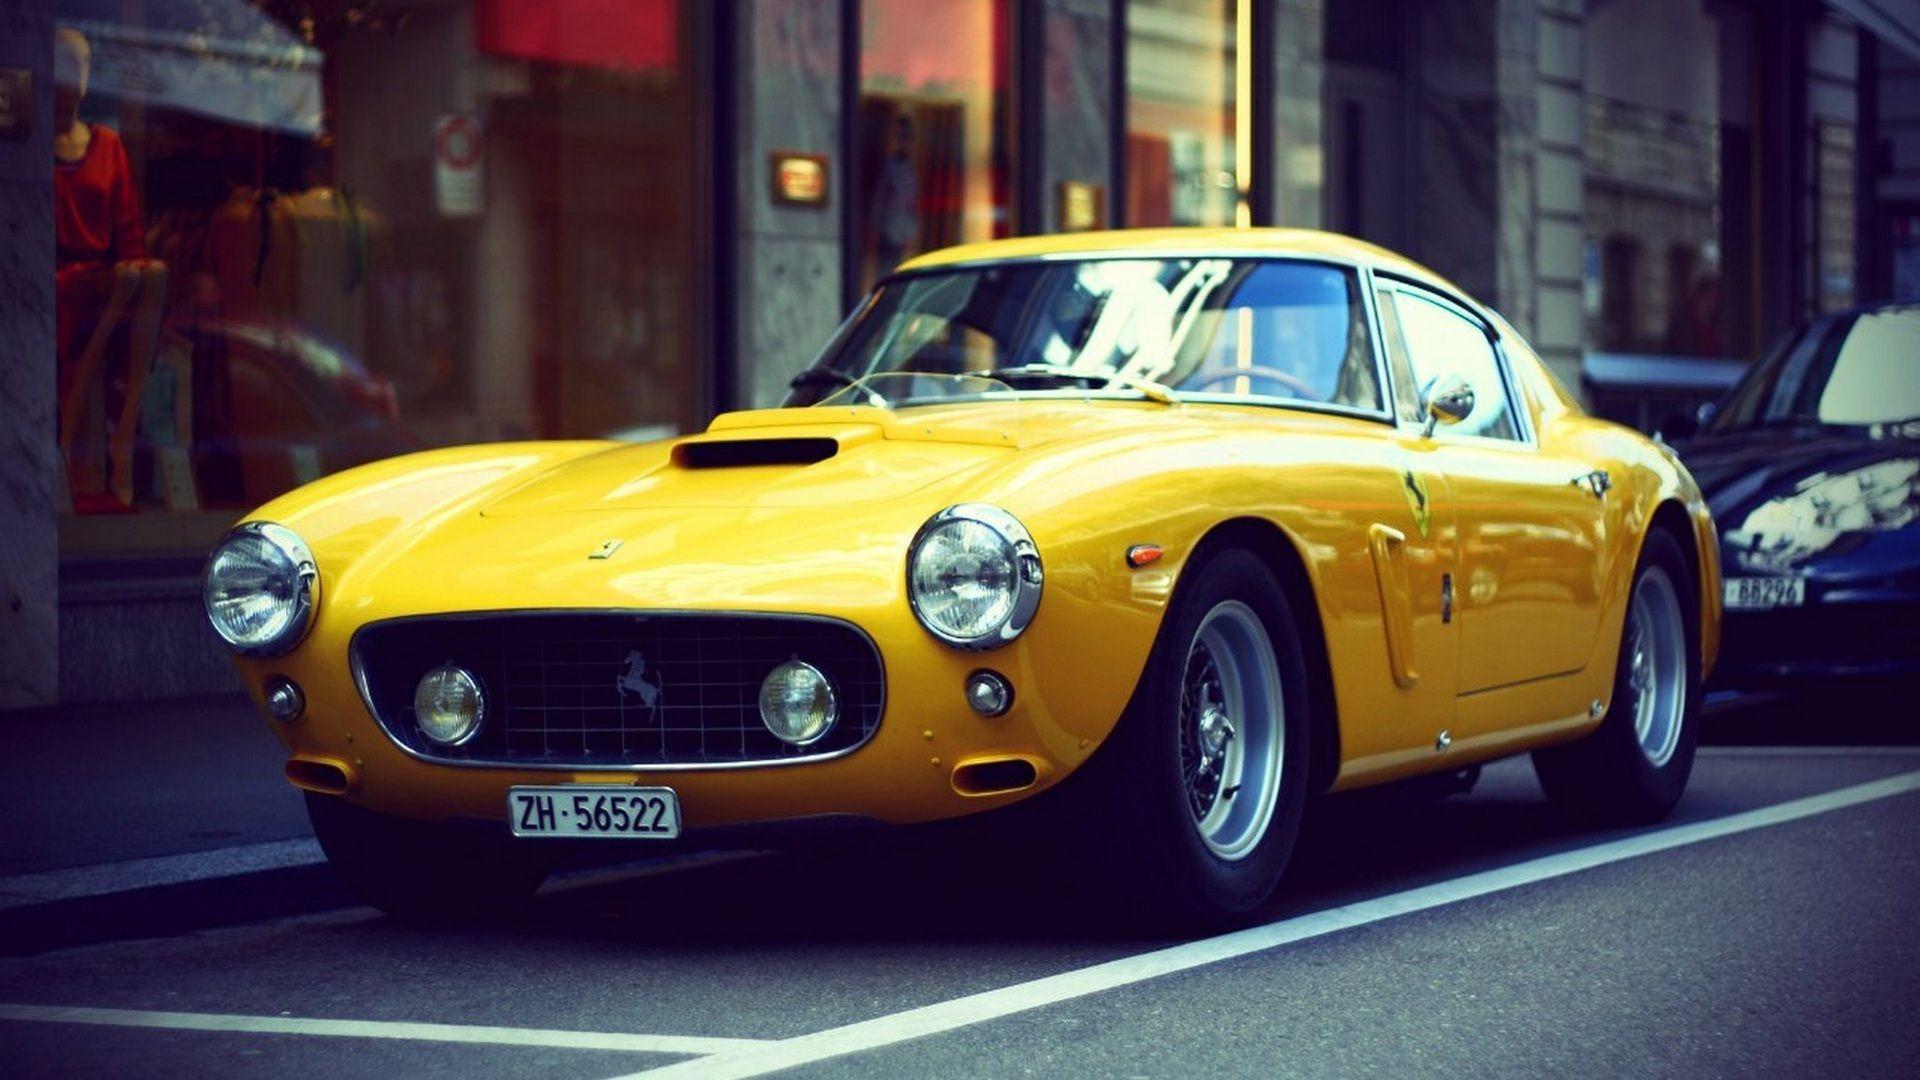 Ferrari yellow retro car wallpaper 1920x1080 | Retro car(Old school ...